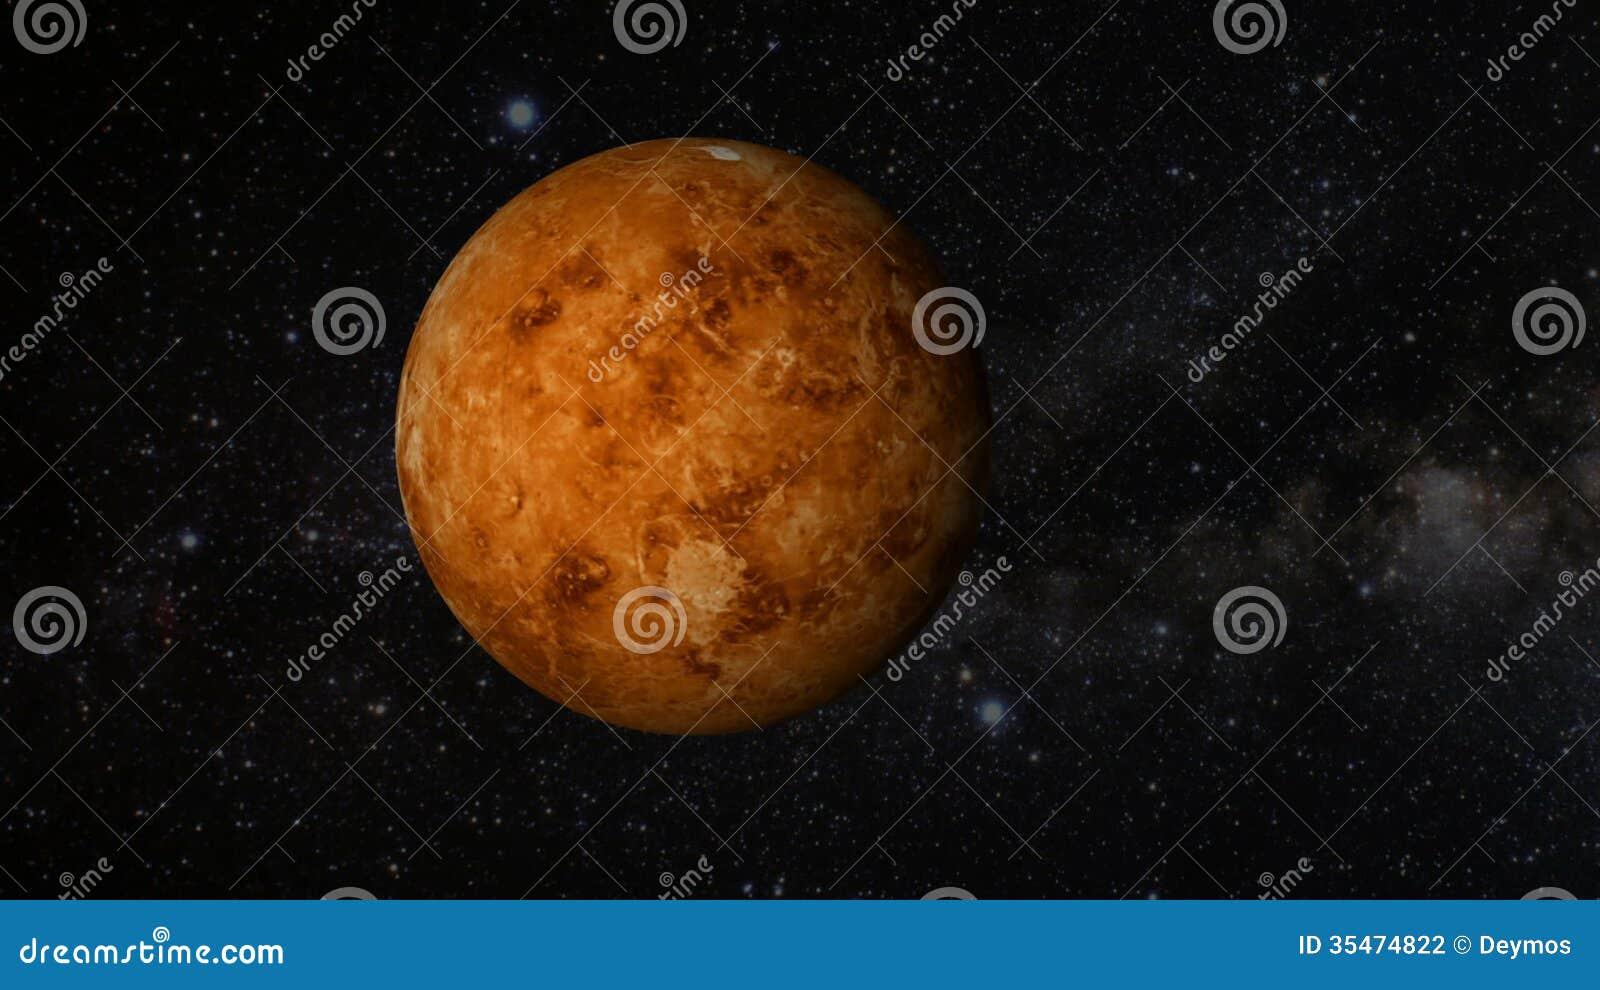 venus planet revolution - photo #39